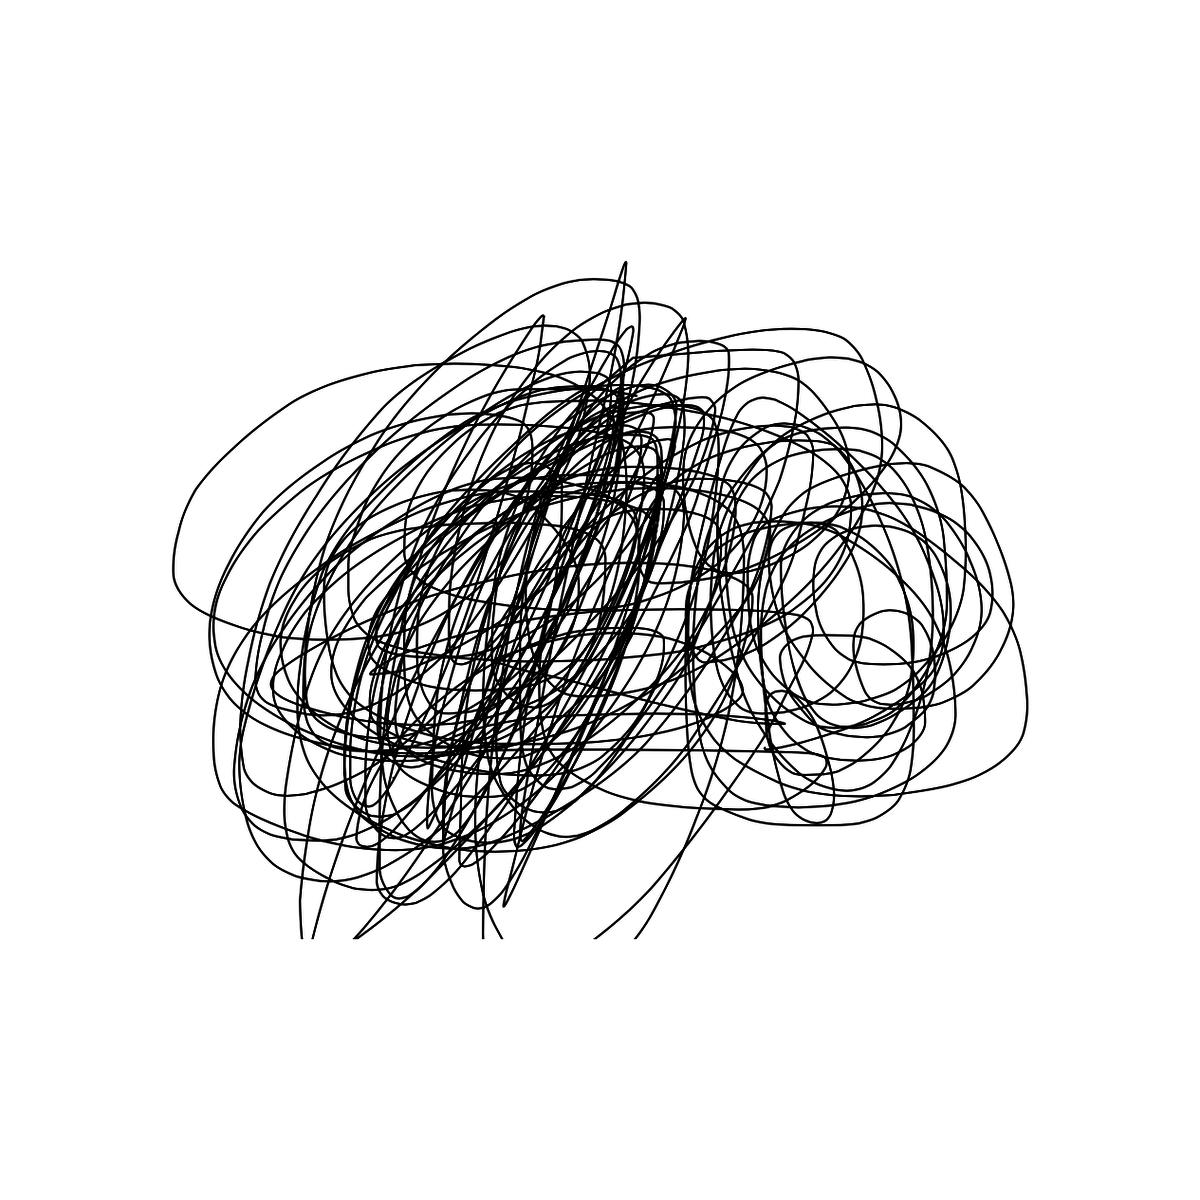 BAAAM drawing#15826 lat:48.2128944396972660lng: 16.3810596466064450